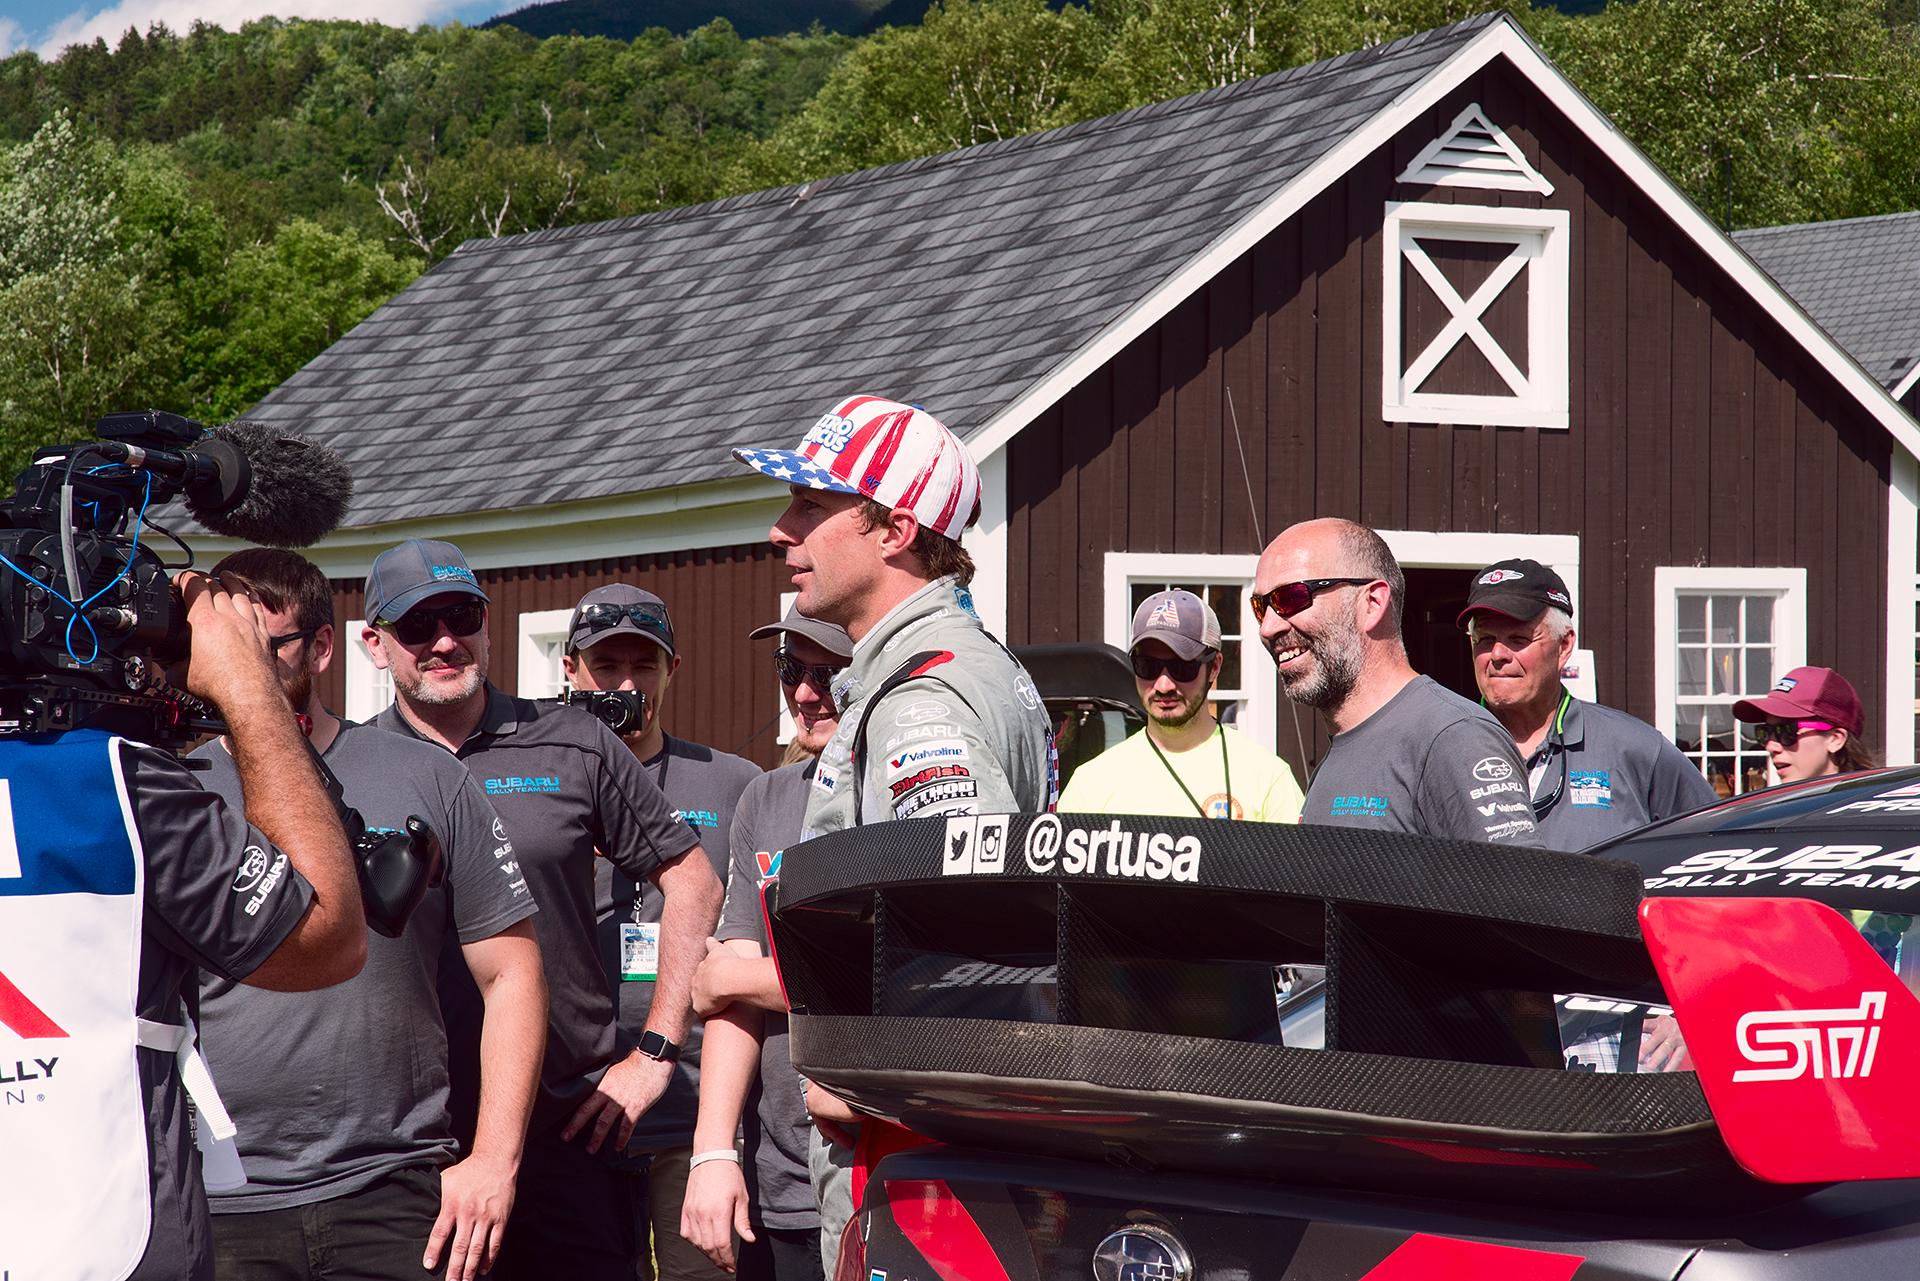 Travis Pastrana and Team Subaru at Climb to the Clouds 2017